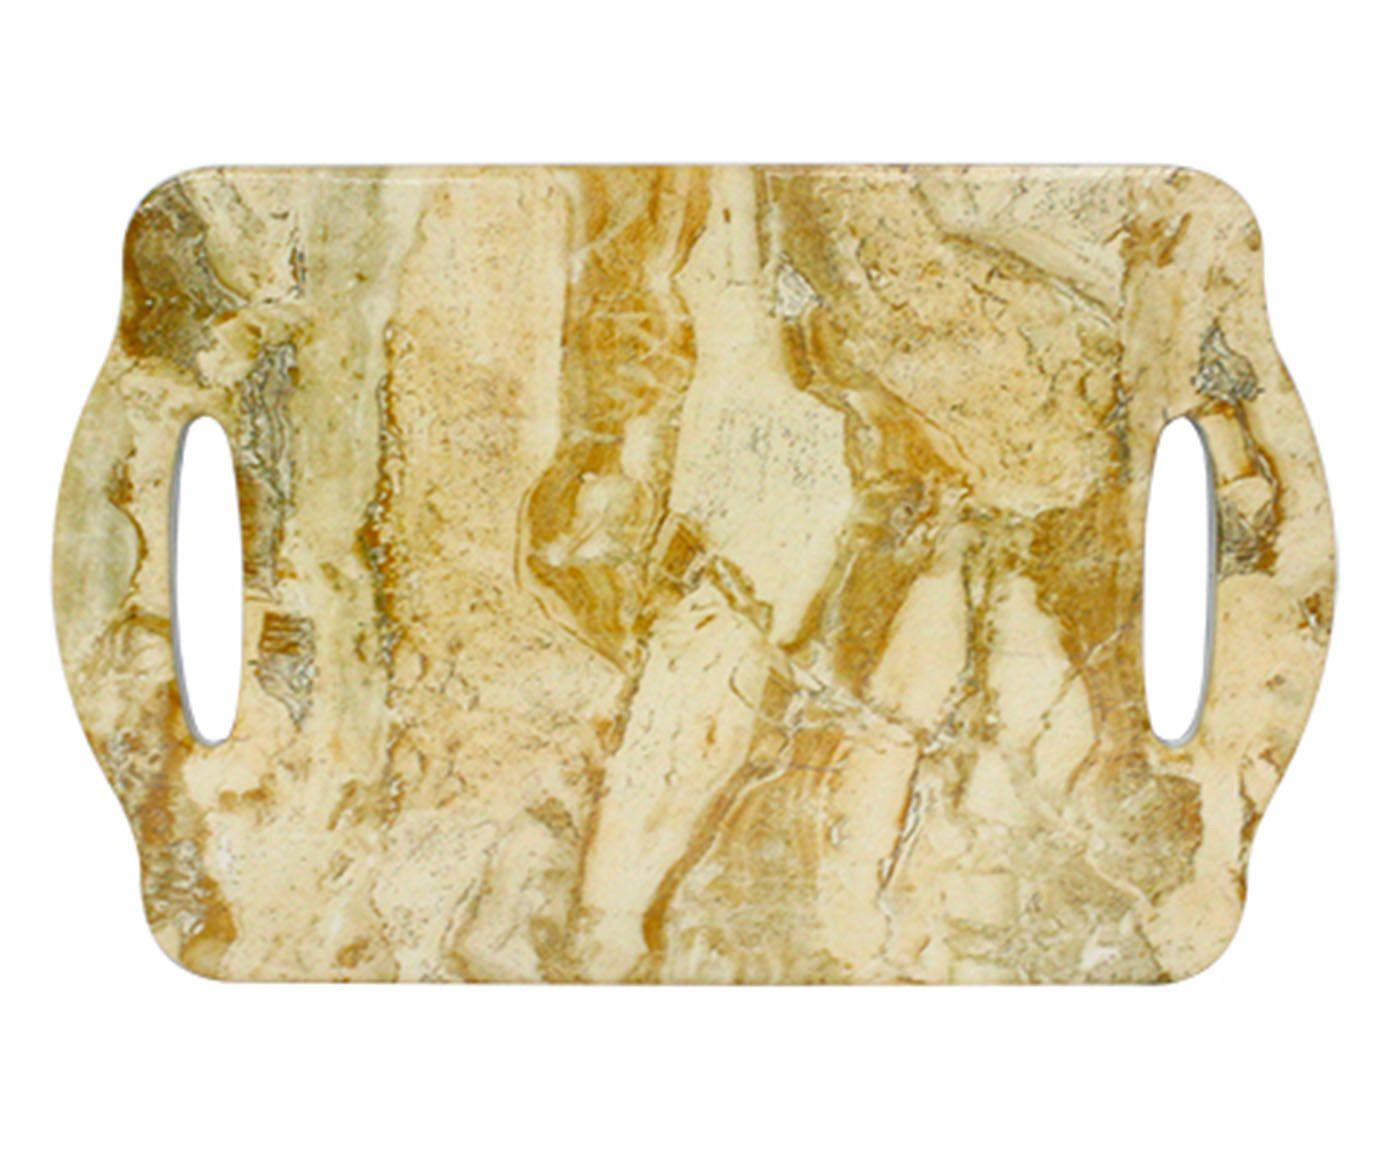 Tábua Decorativa Pedra Bege - 18X1,5X28cm | Westwing.com.br